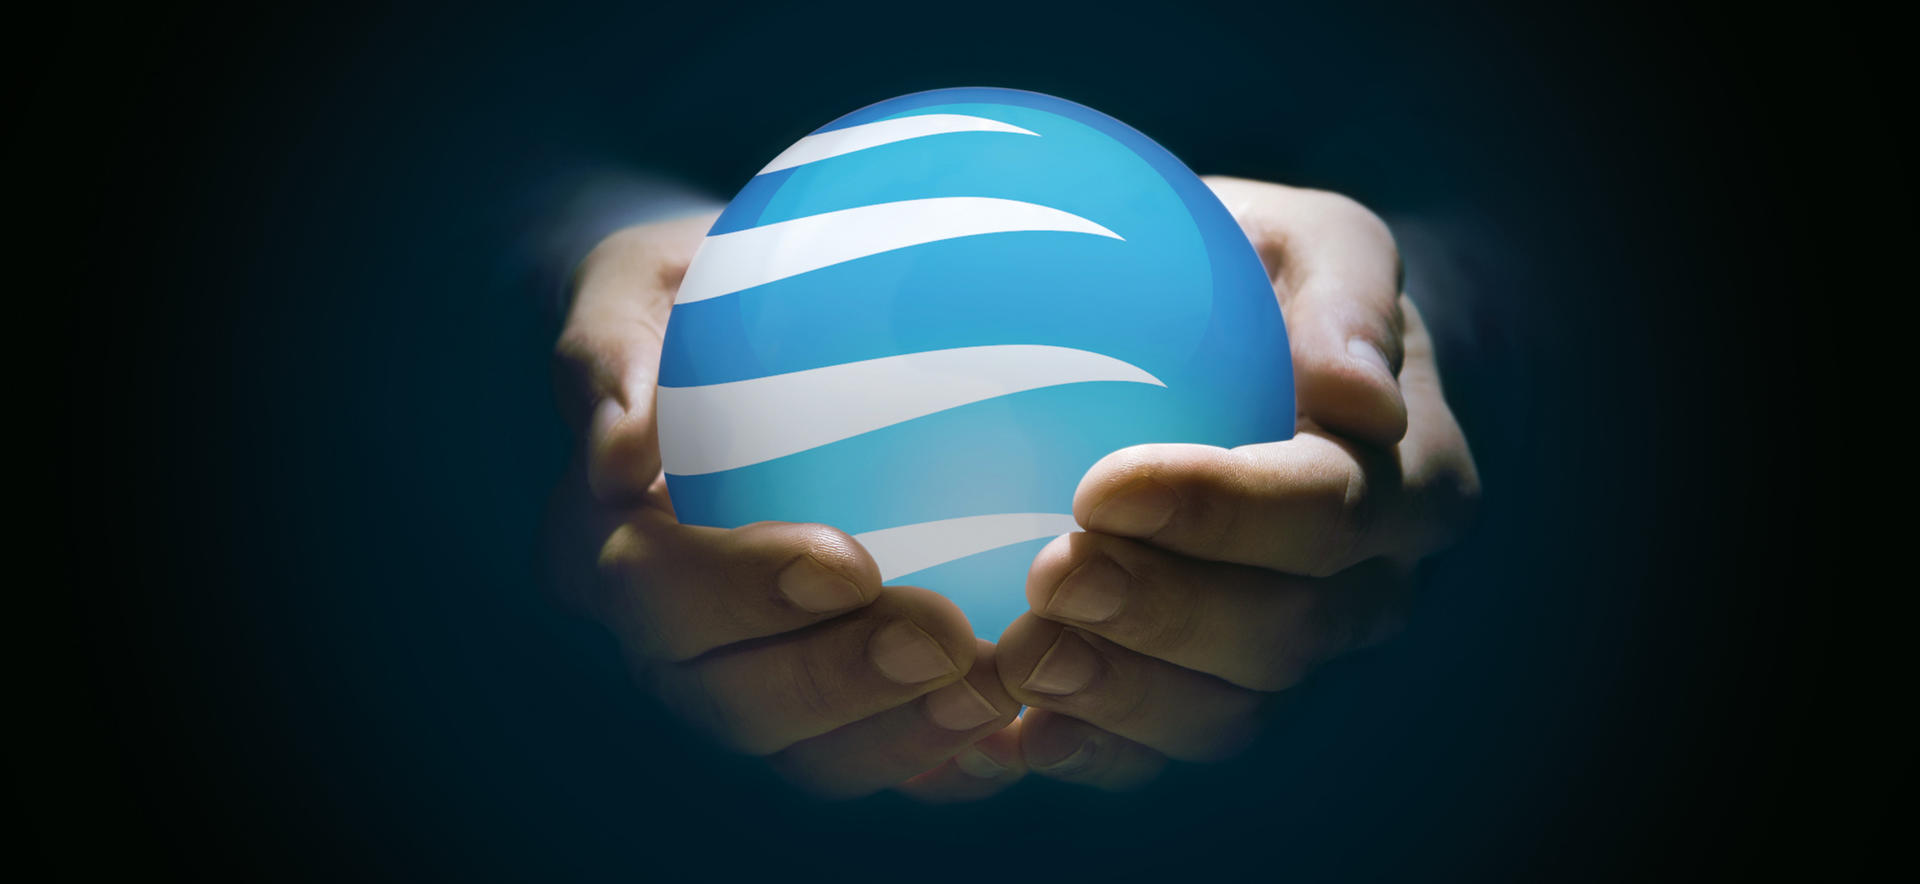 Skagerak globe in a hand.